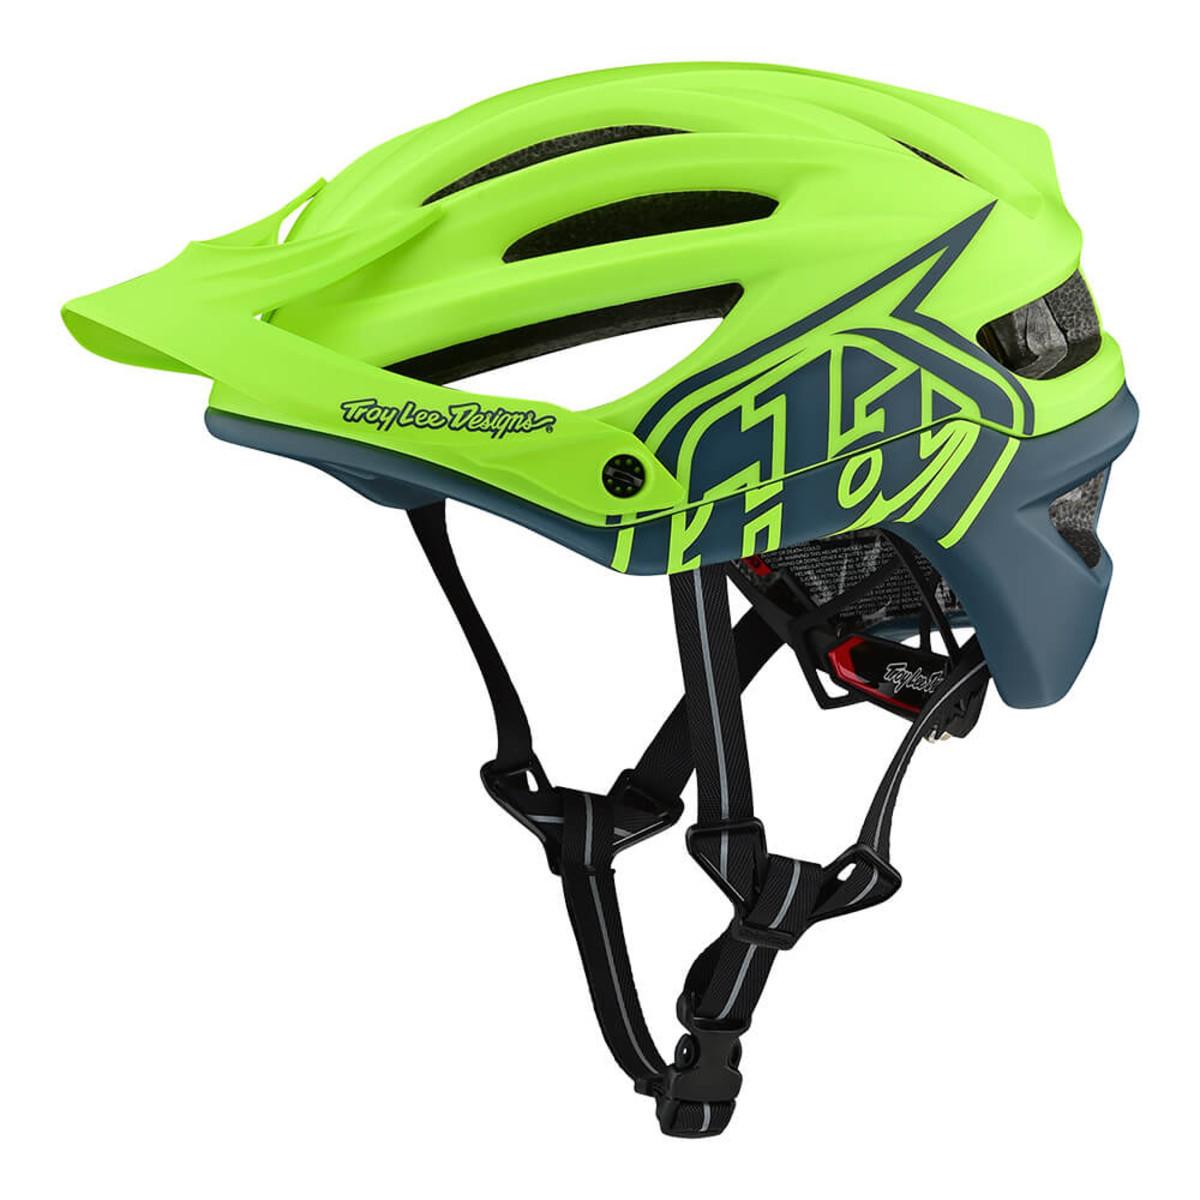 Вело шлем TLD A2 Mips Decoy [Flo Yellow / AIR Force Blue] размер M/L